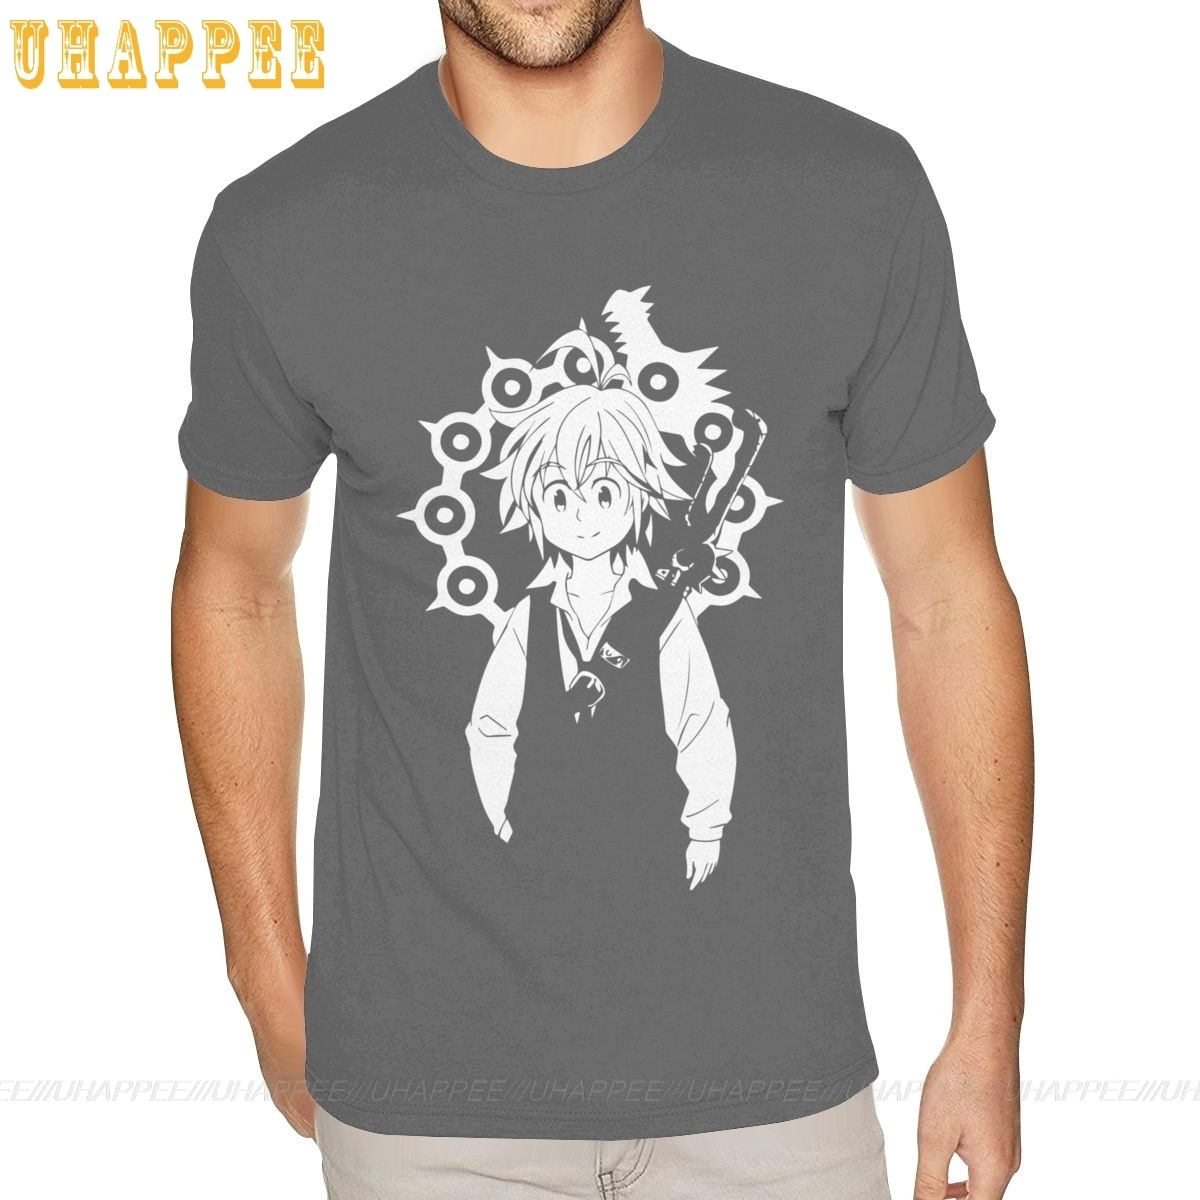 Las siete pecados capitales Meliodas camisetas S-6XL linda camisa masculina